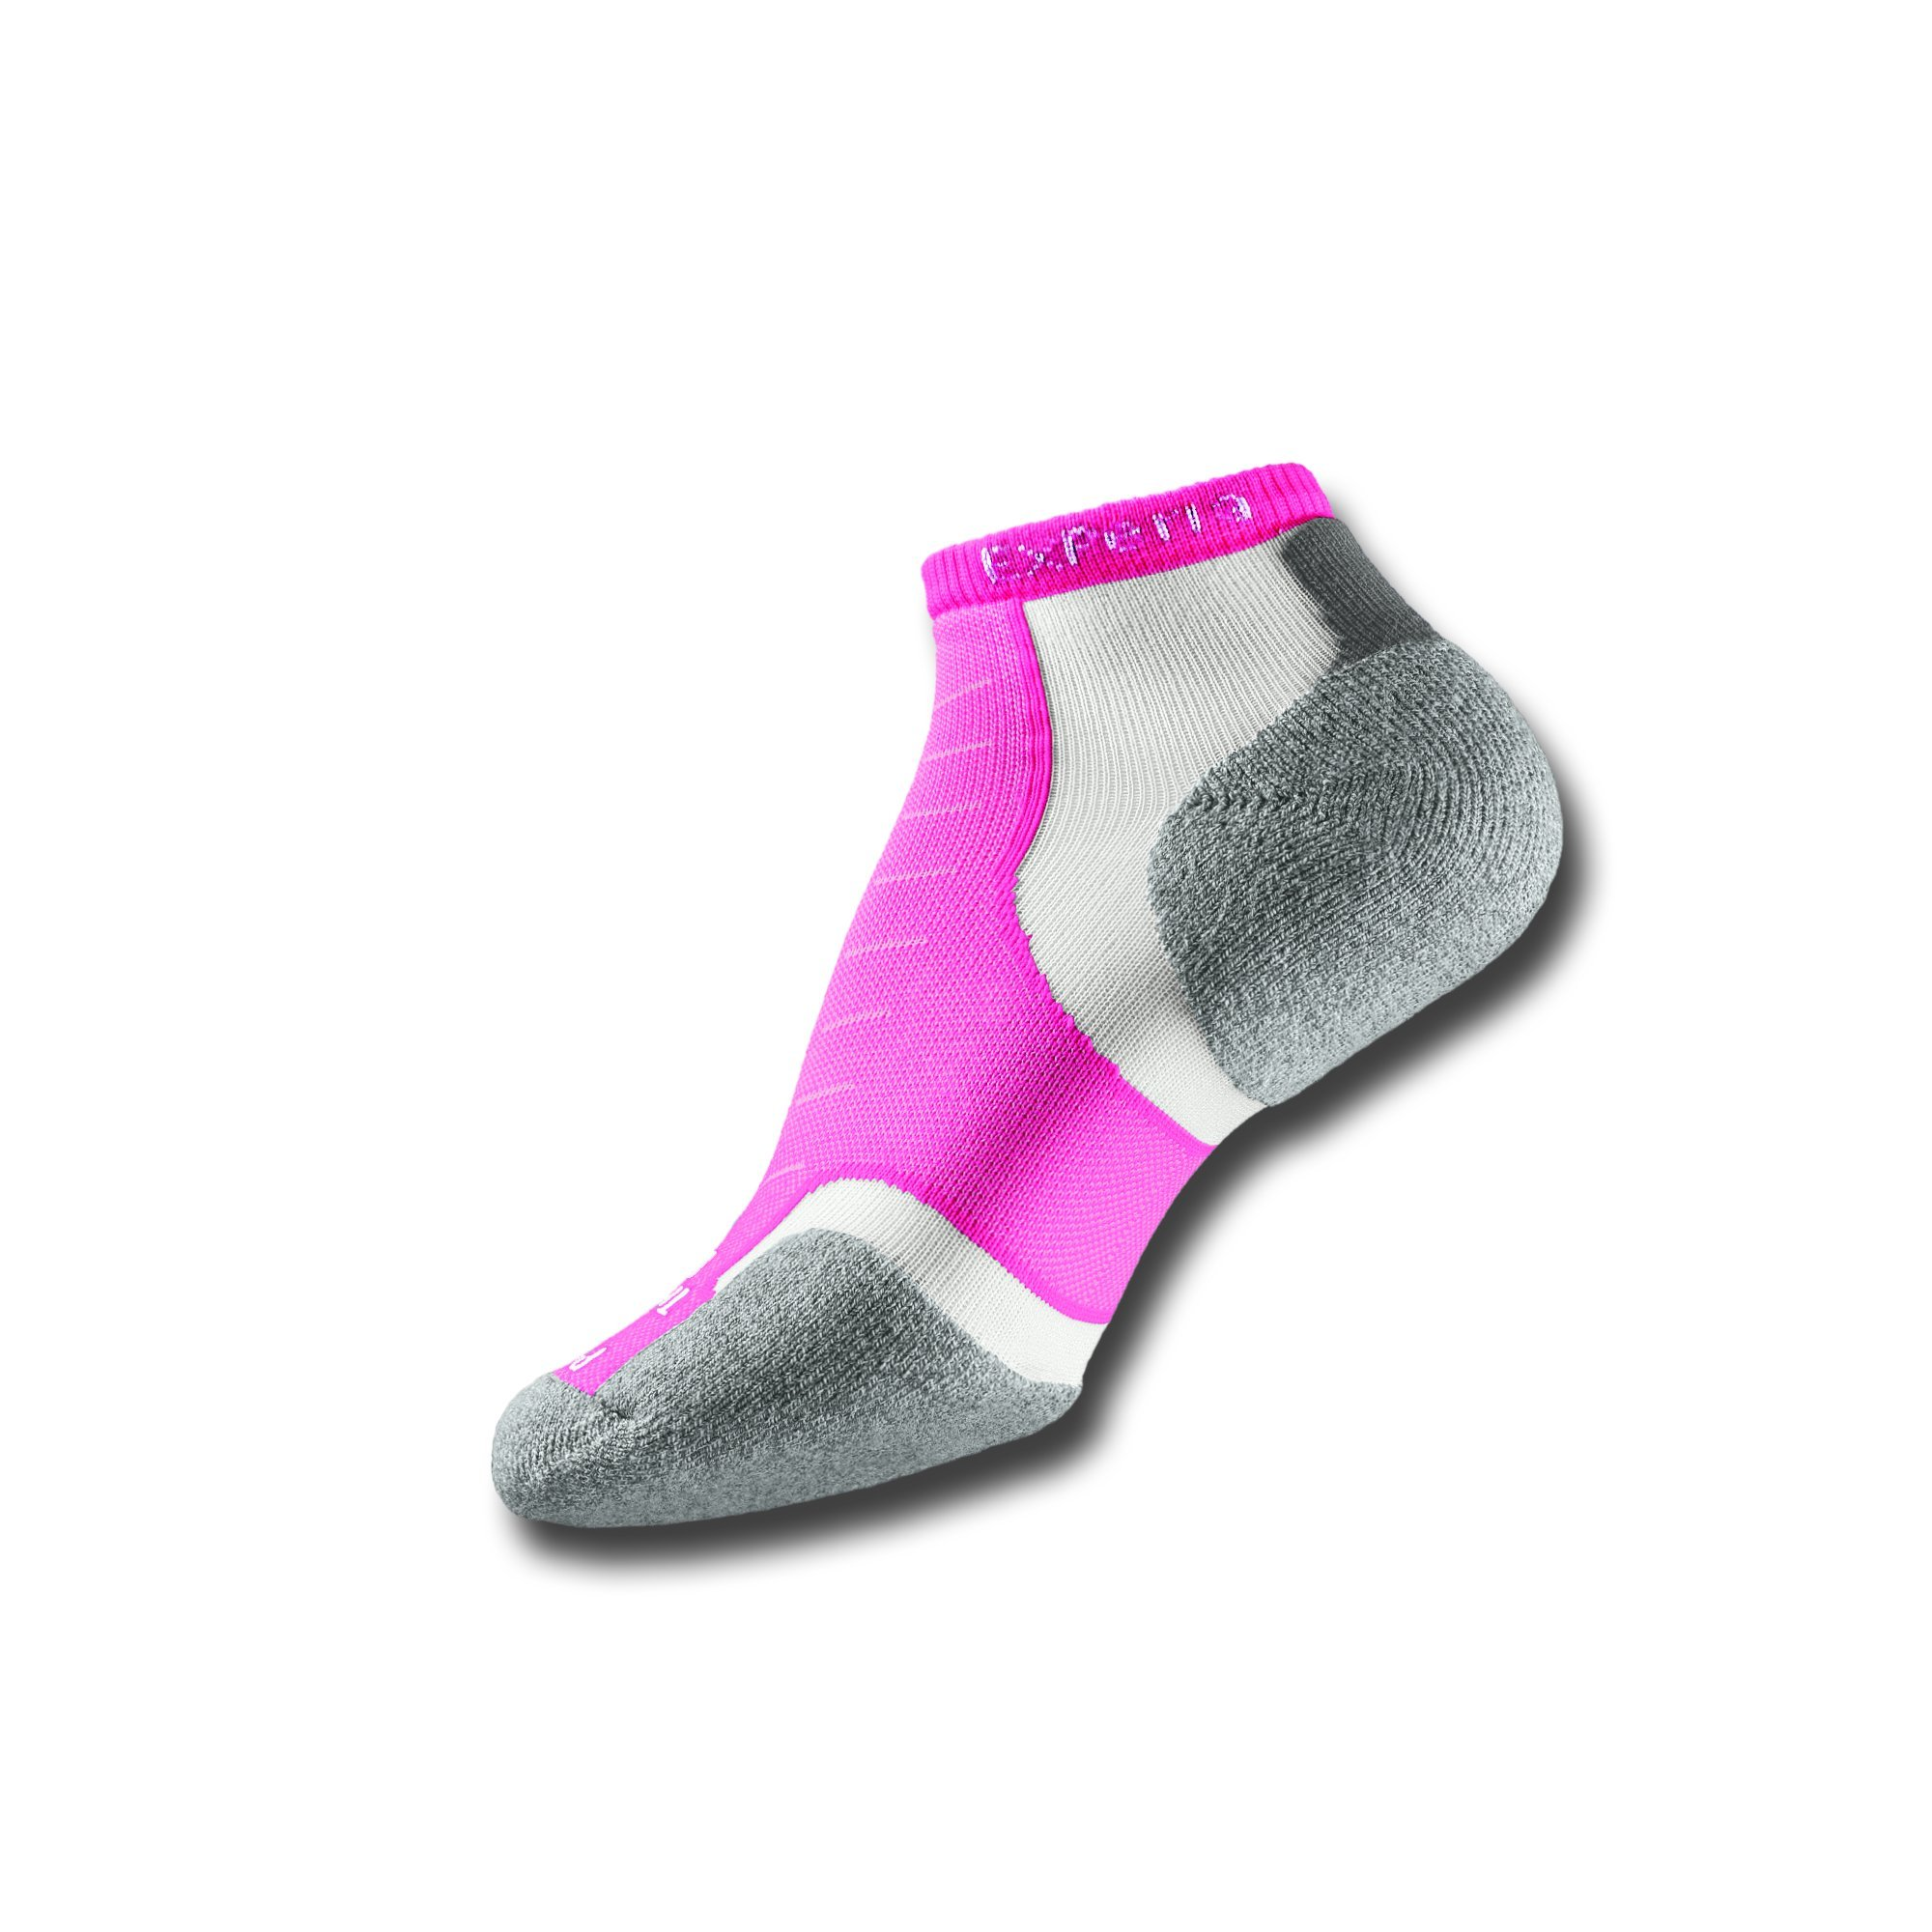 Thorlos Experia Unisex XCCU Multi-Sport Thin Padded Low Cut Sock, Pink, Medium